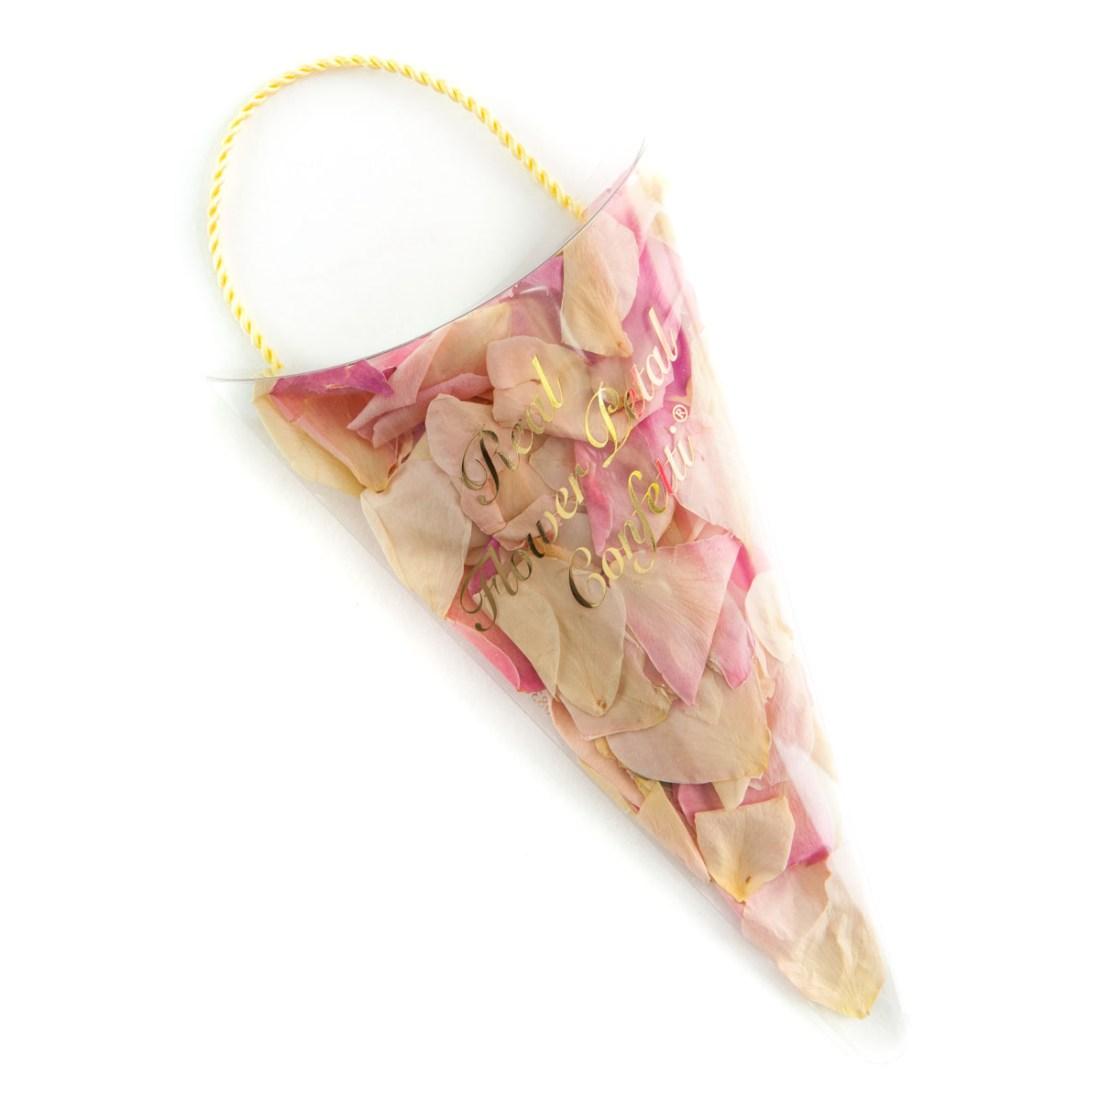 Biodegradable Confetti - Soft Pinks Rose Petals - Petal Sachet